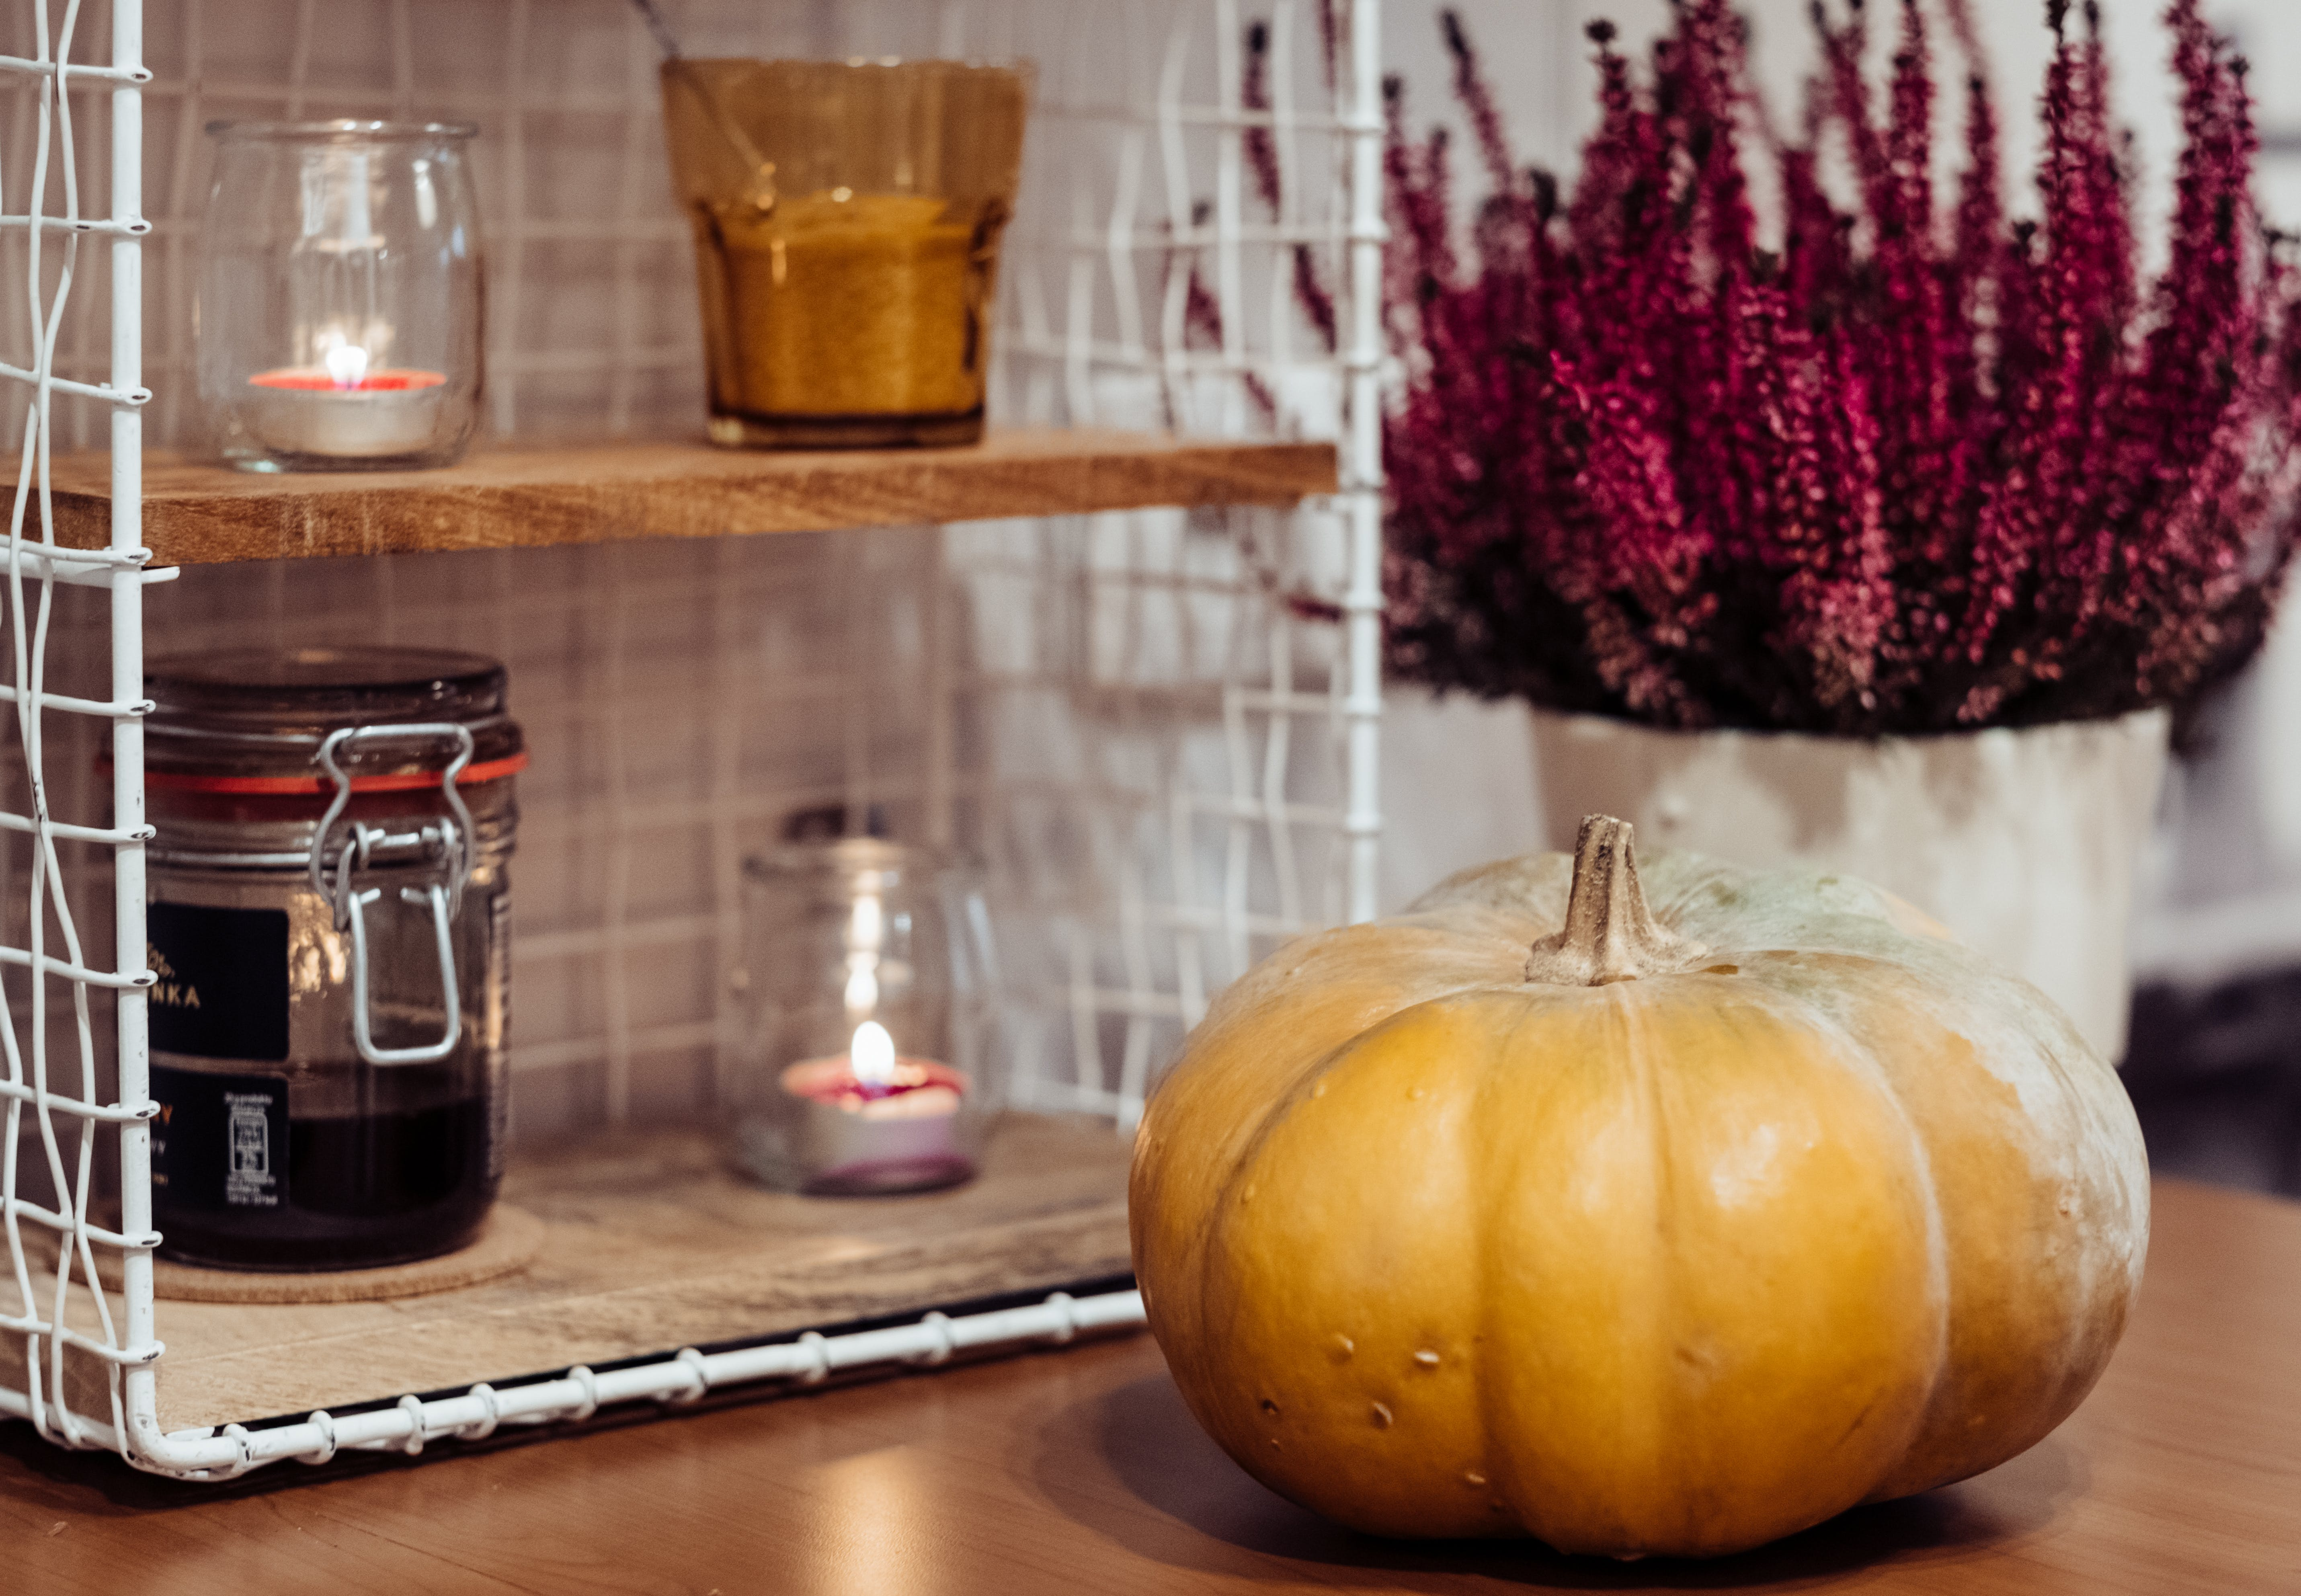 Pumpkin Near White Rack on Table